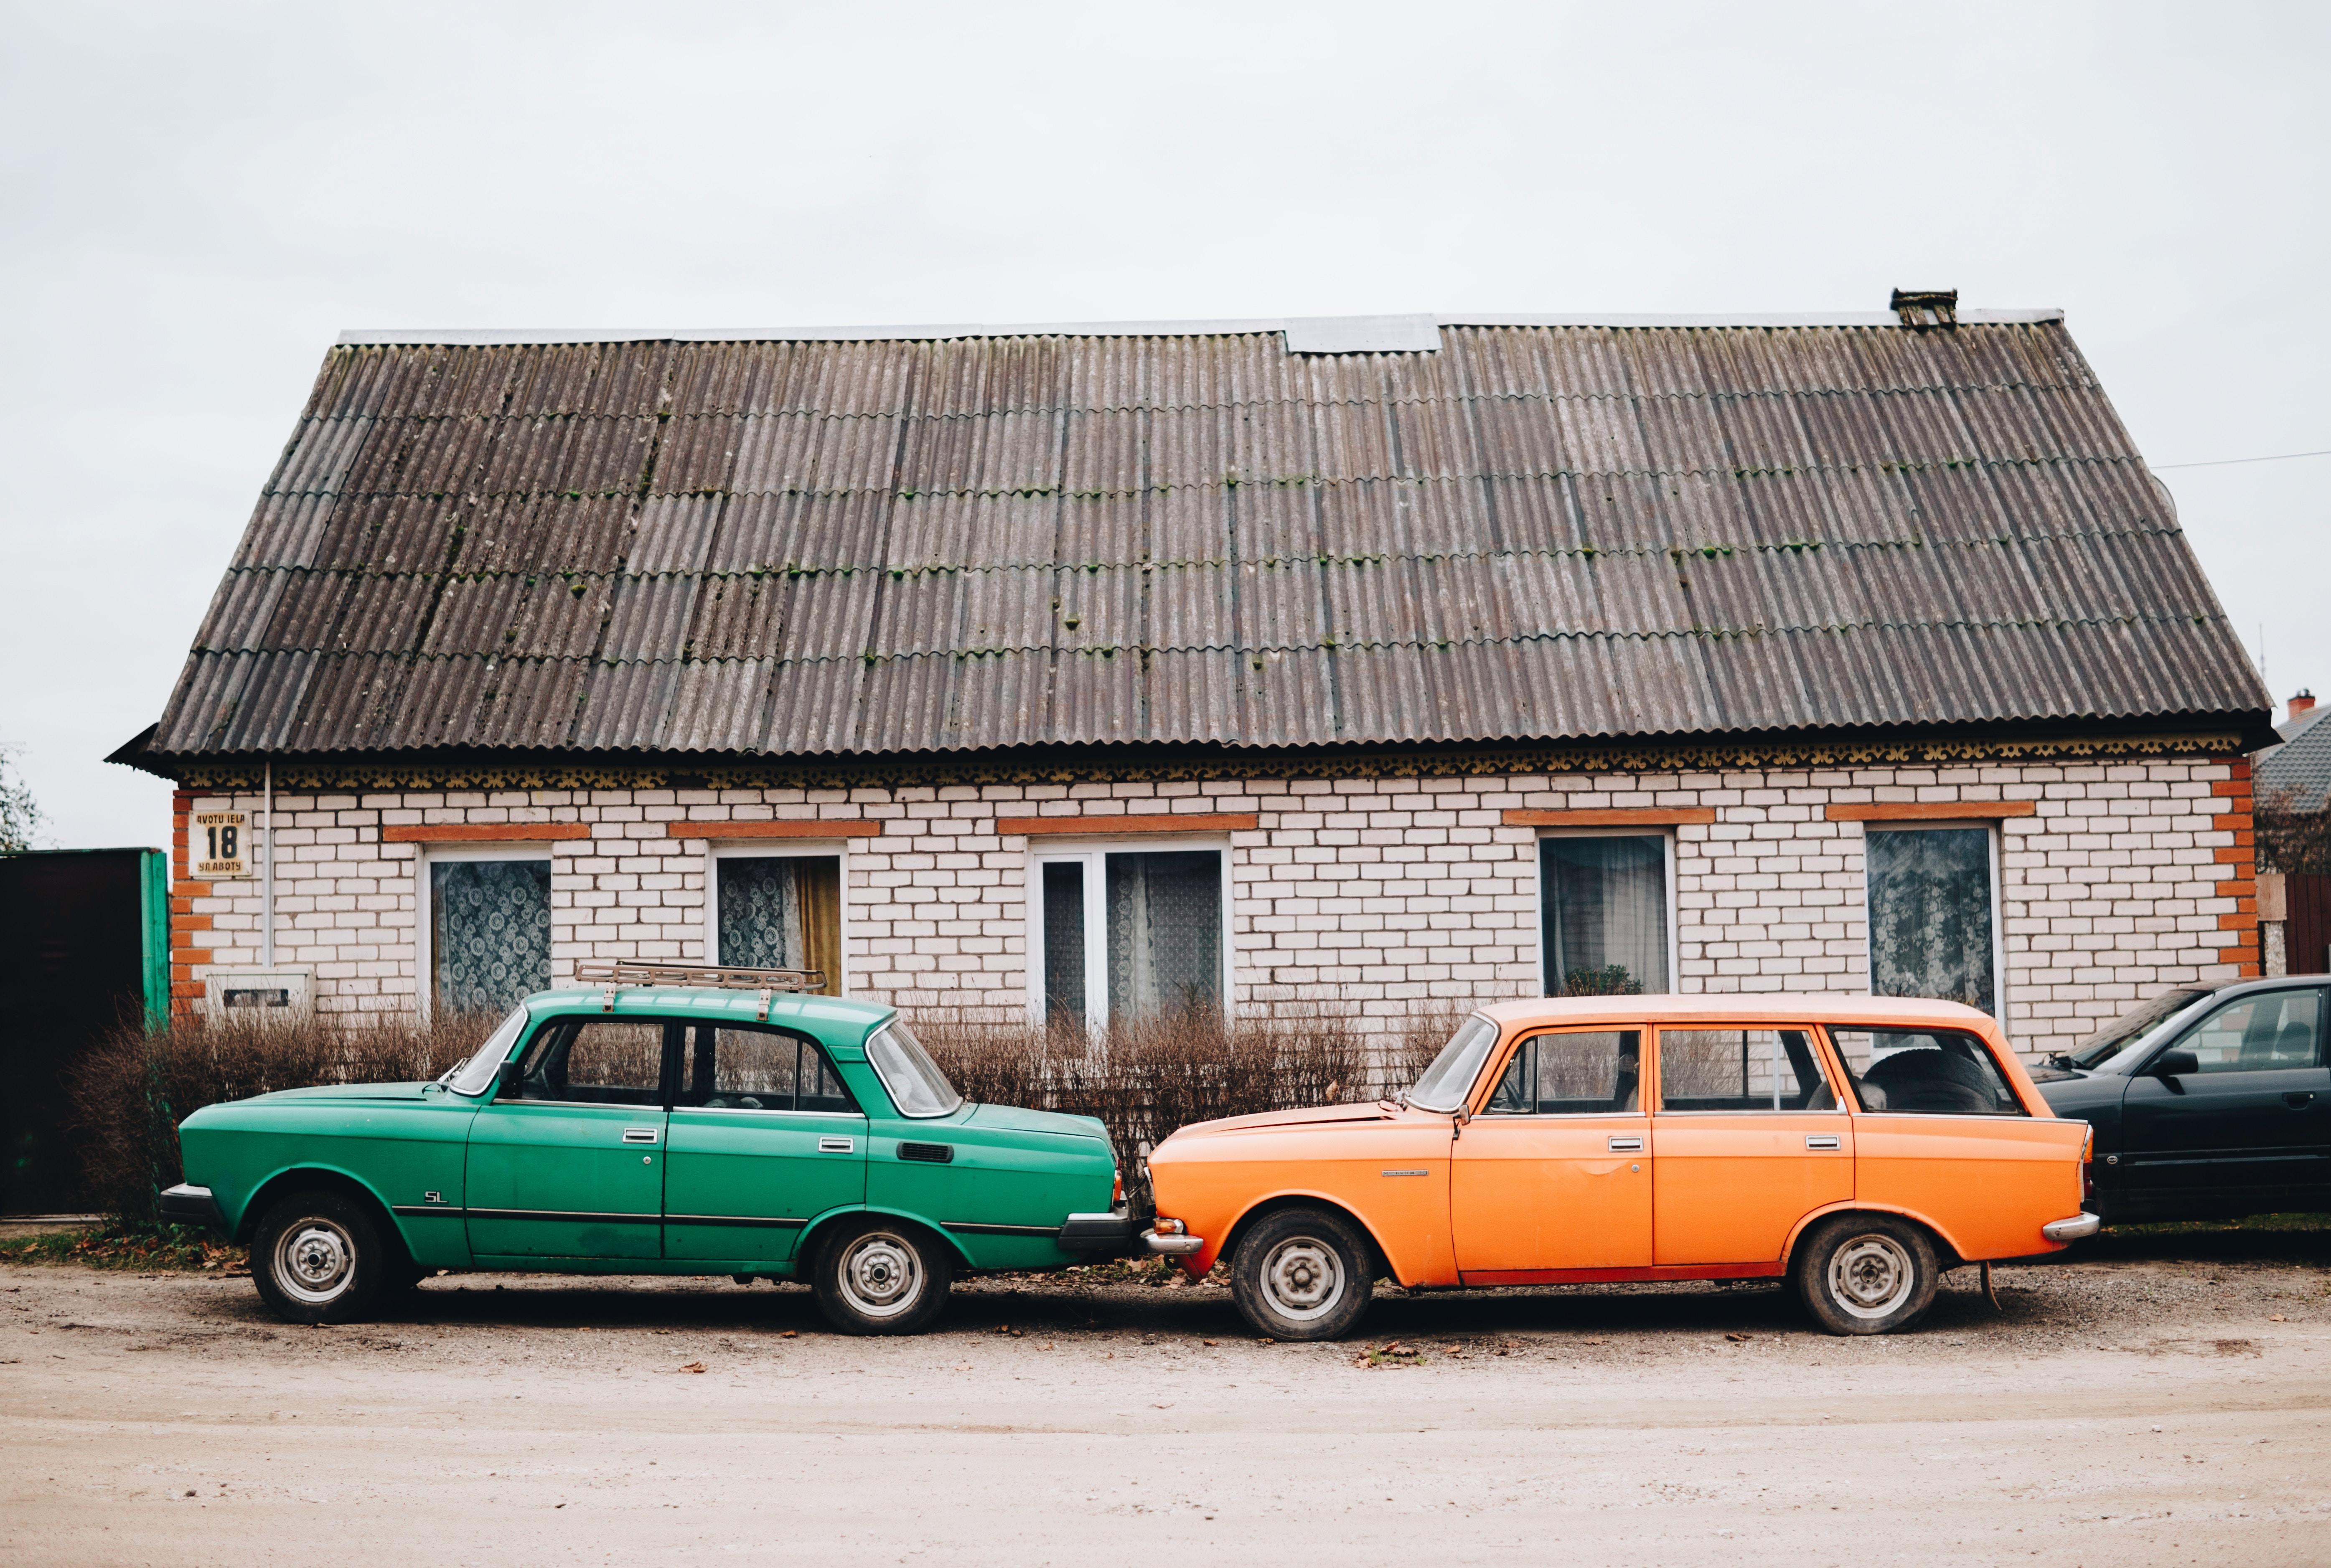 green sedan and orange station wagon beside building